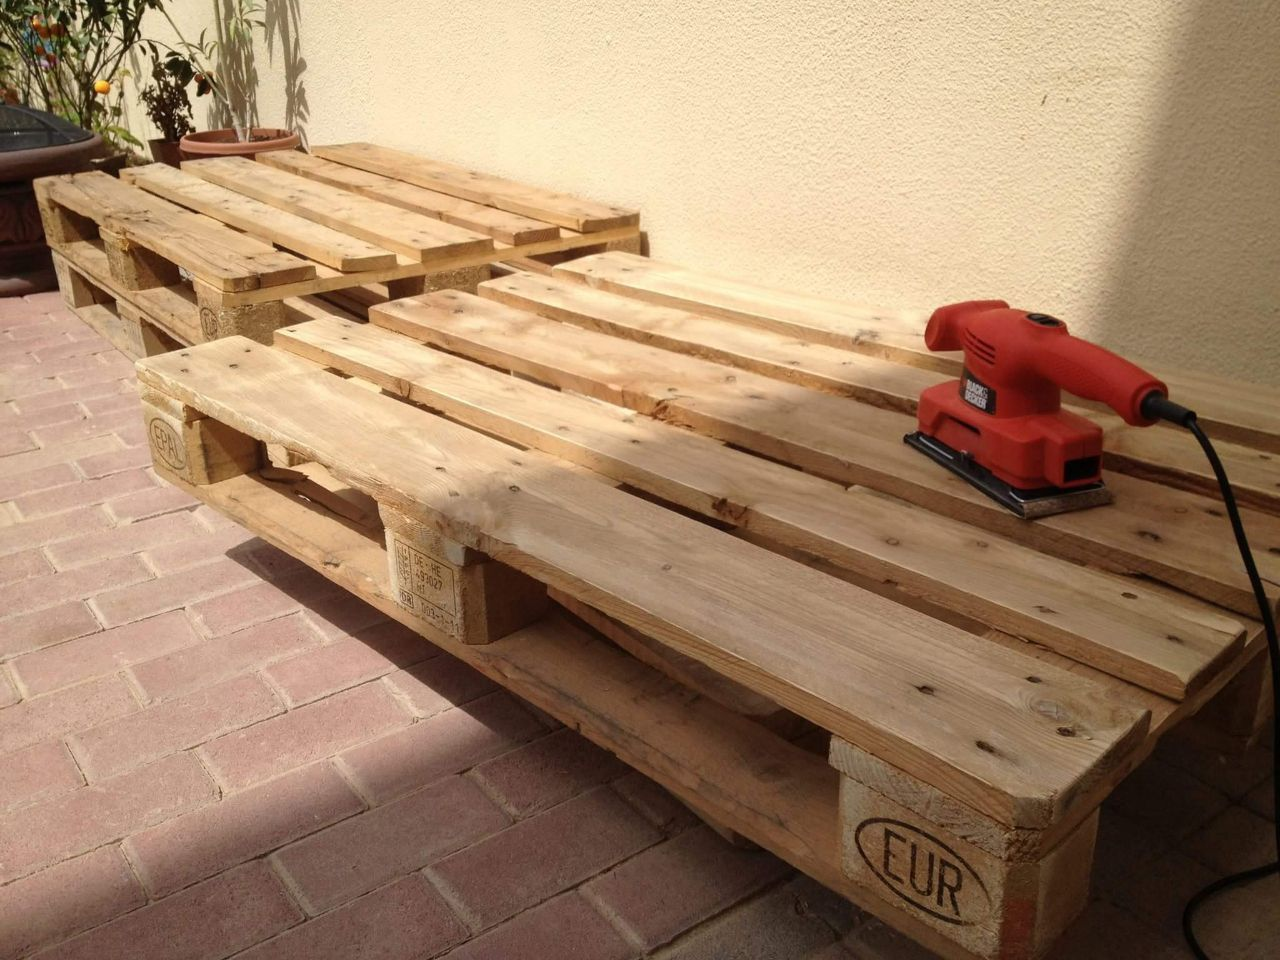 Wooden Pallets 0555450341 30